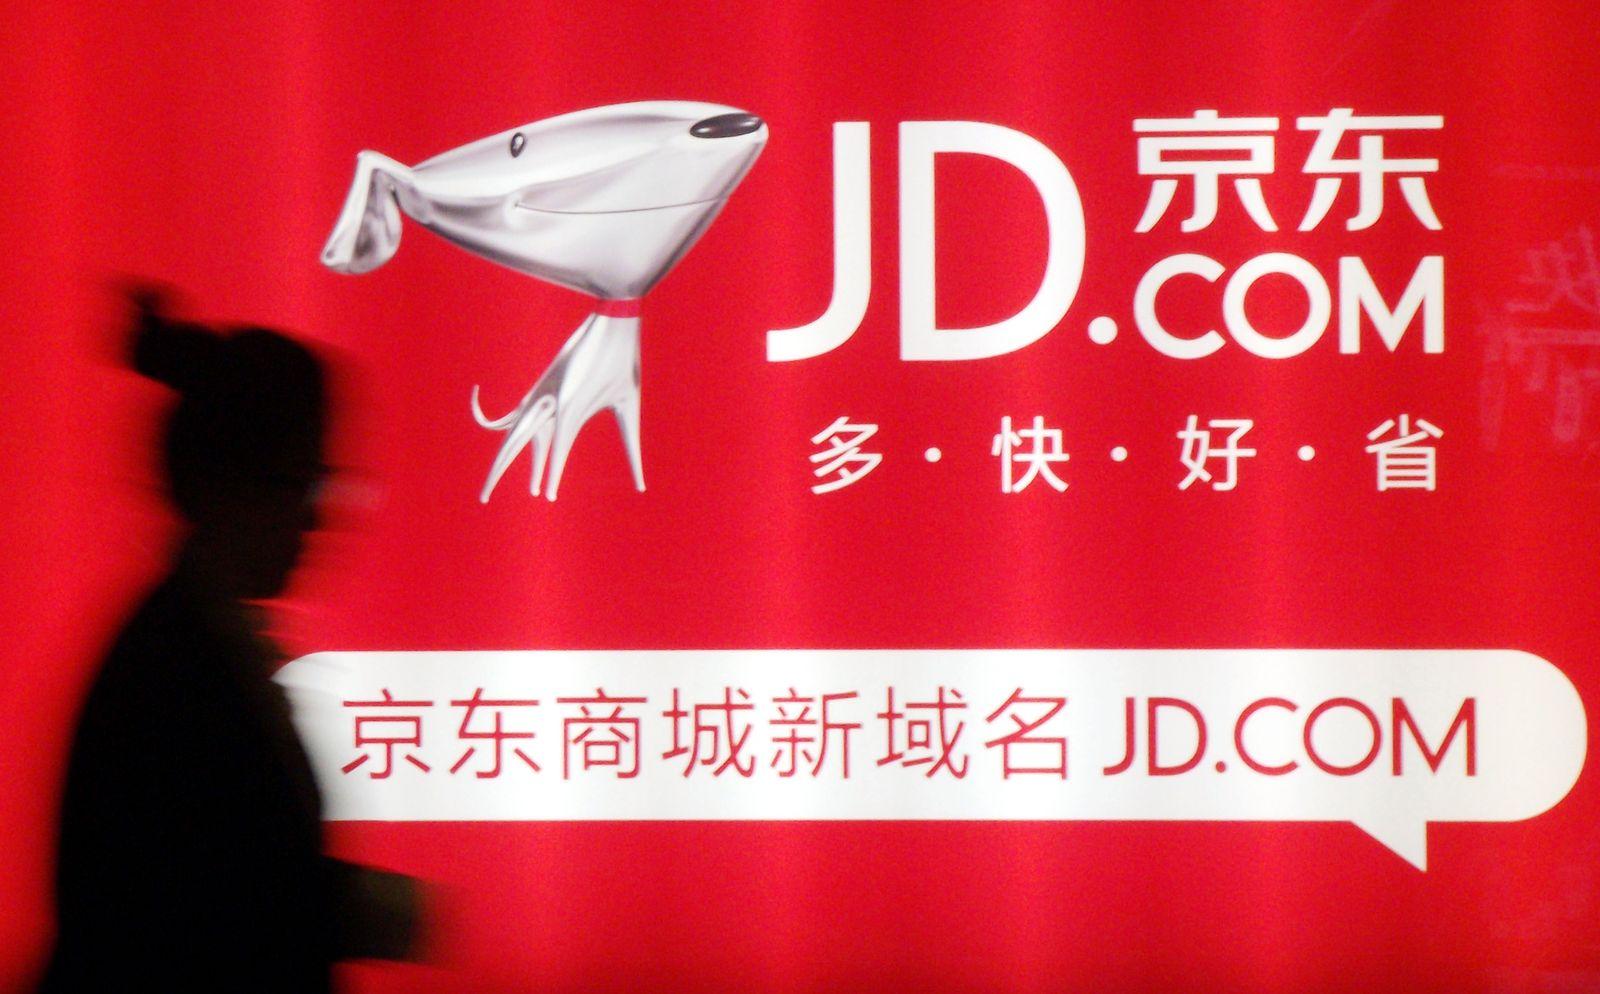 Jingdong Mall / jd.com